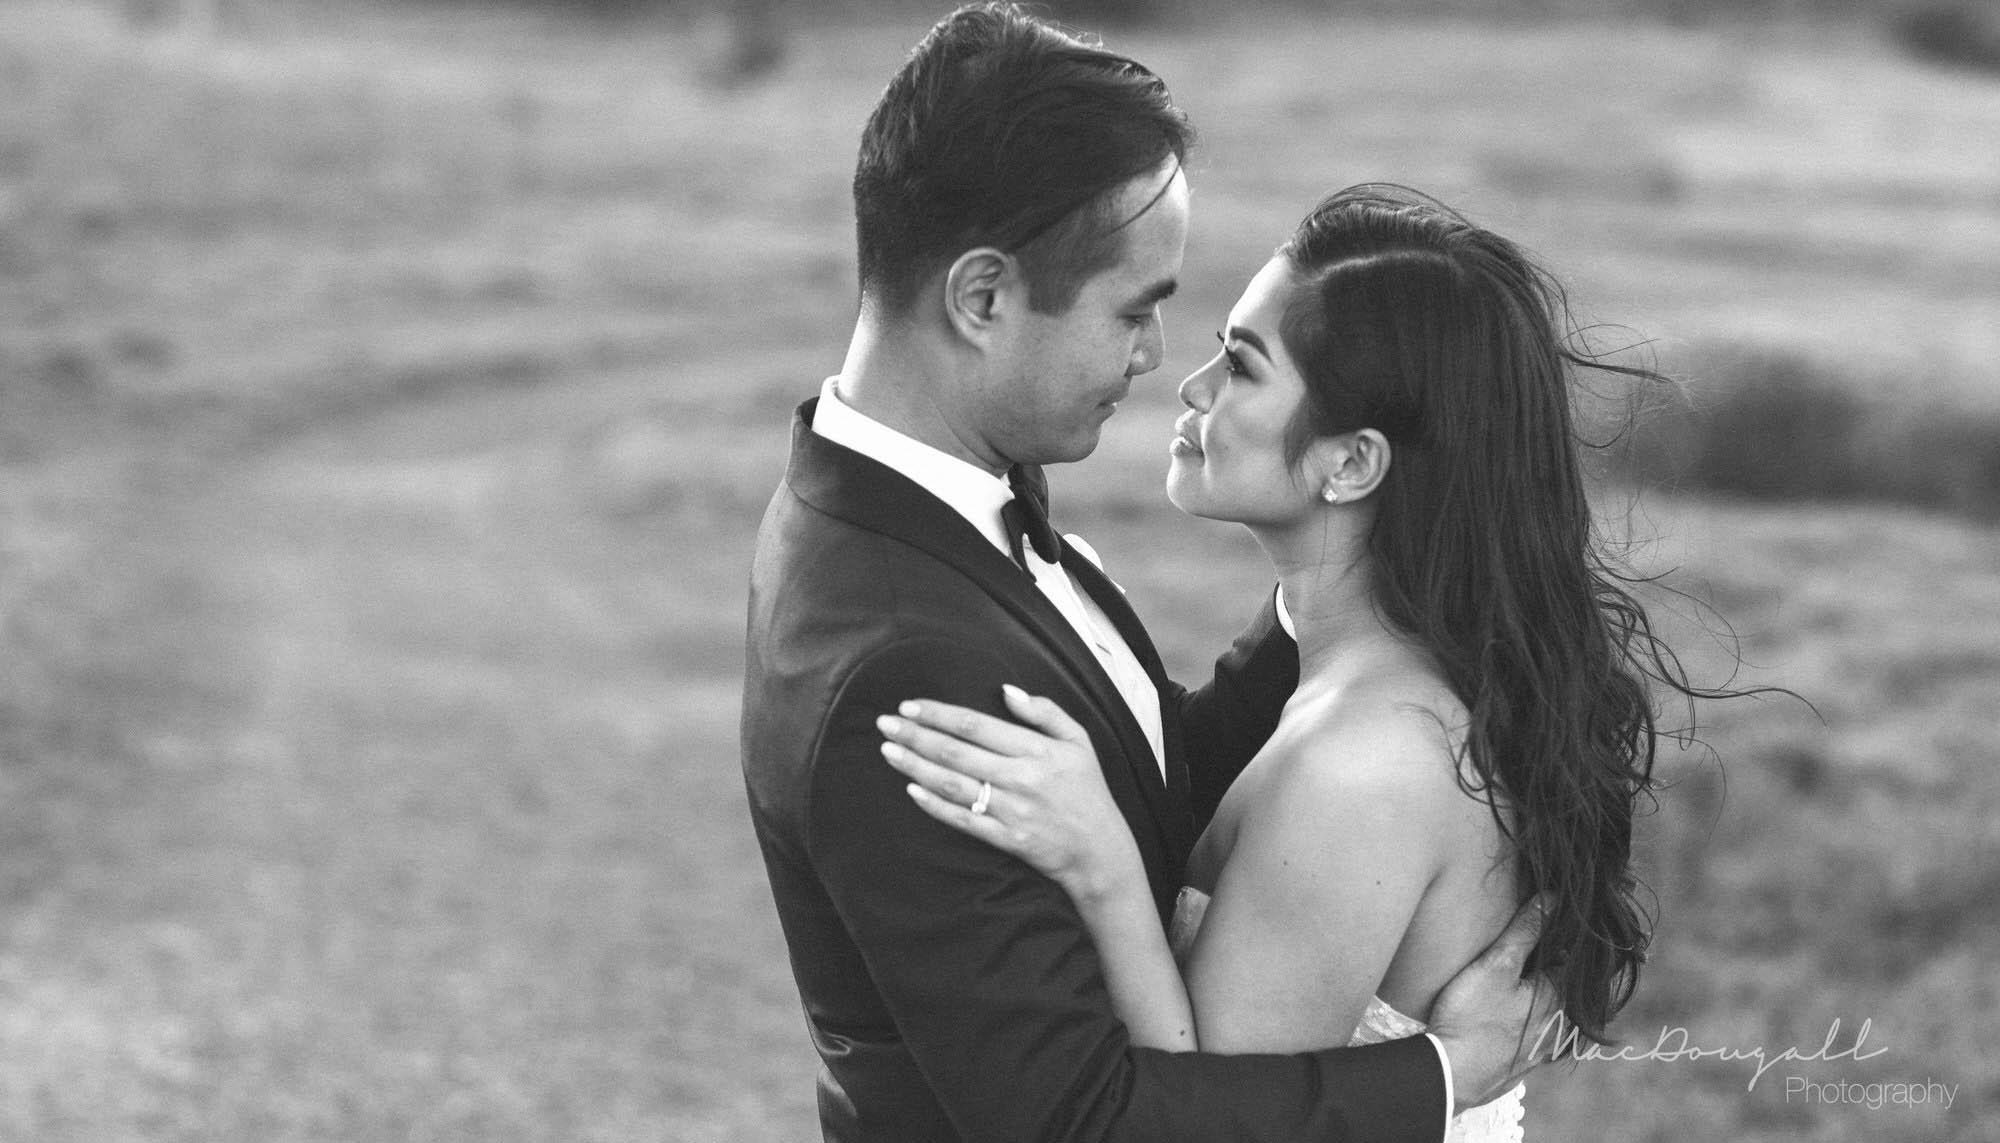 MacDougall-Photography-Sydney-Wedding-Photographers-12.jpg